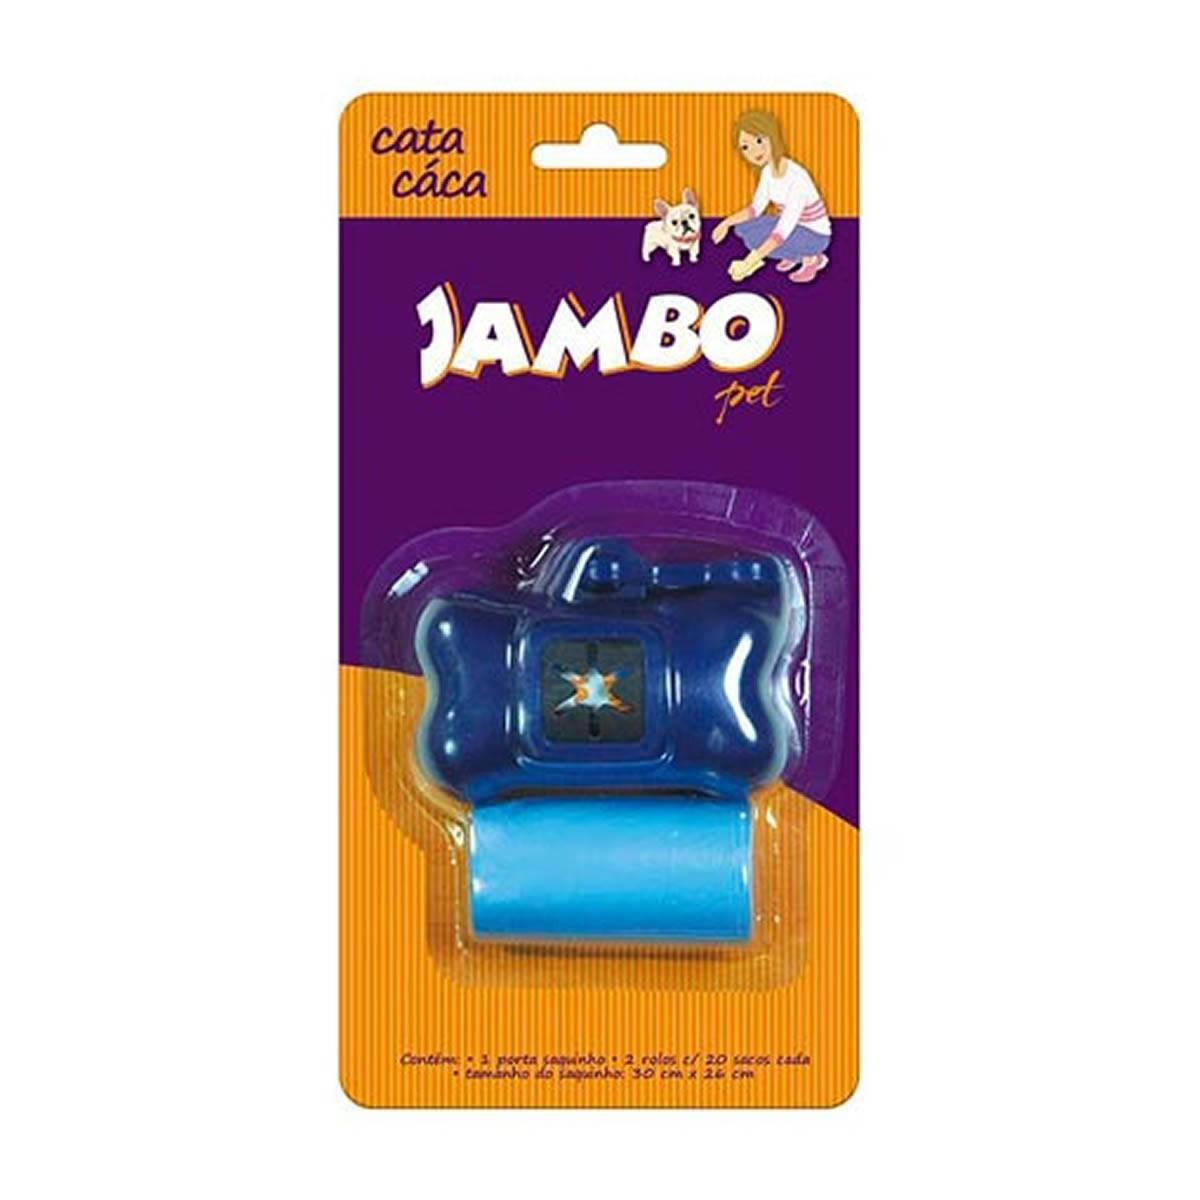 Conjunto Cata Caca Basic Jambo Pet Azul